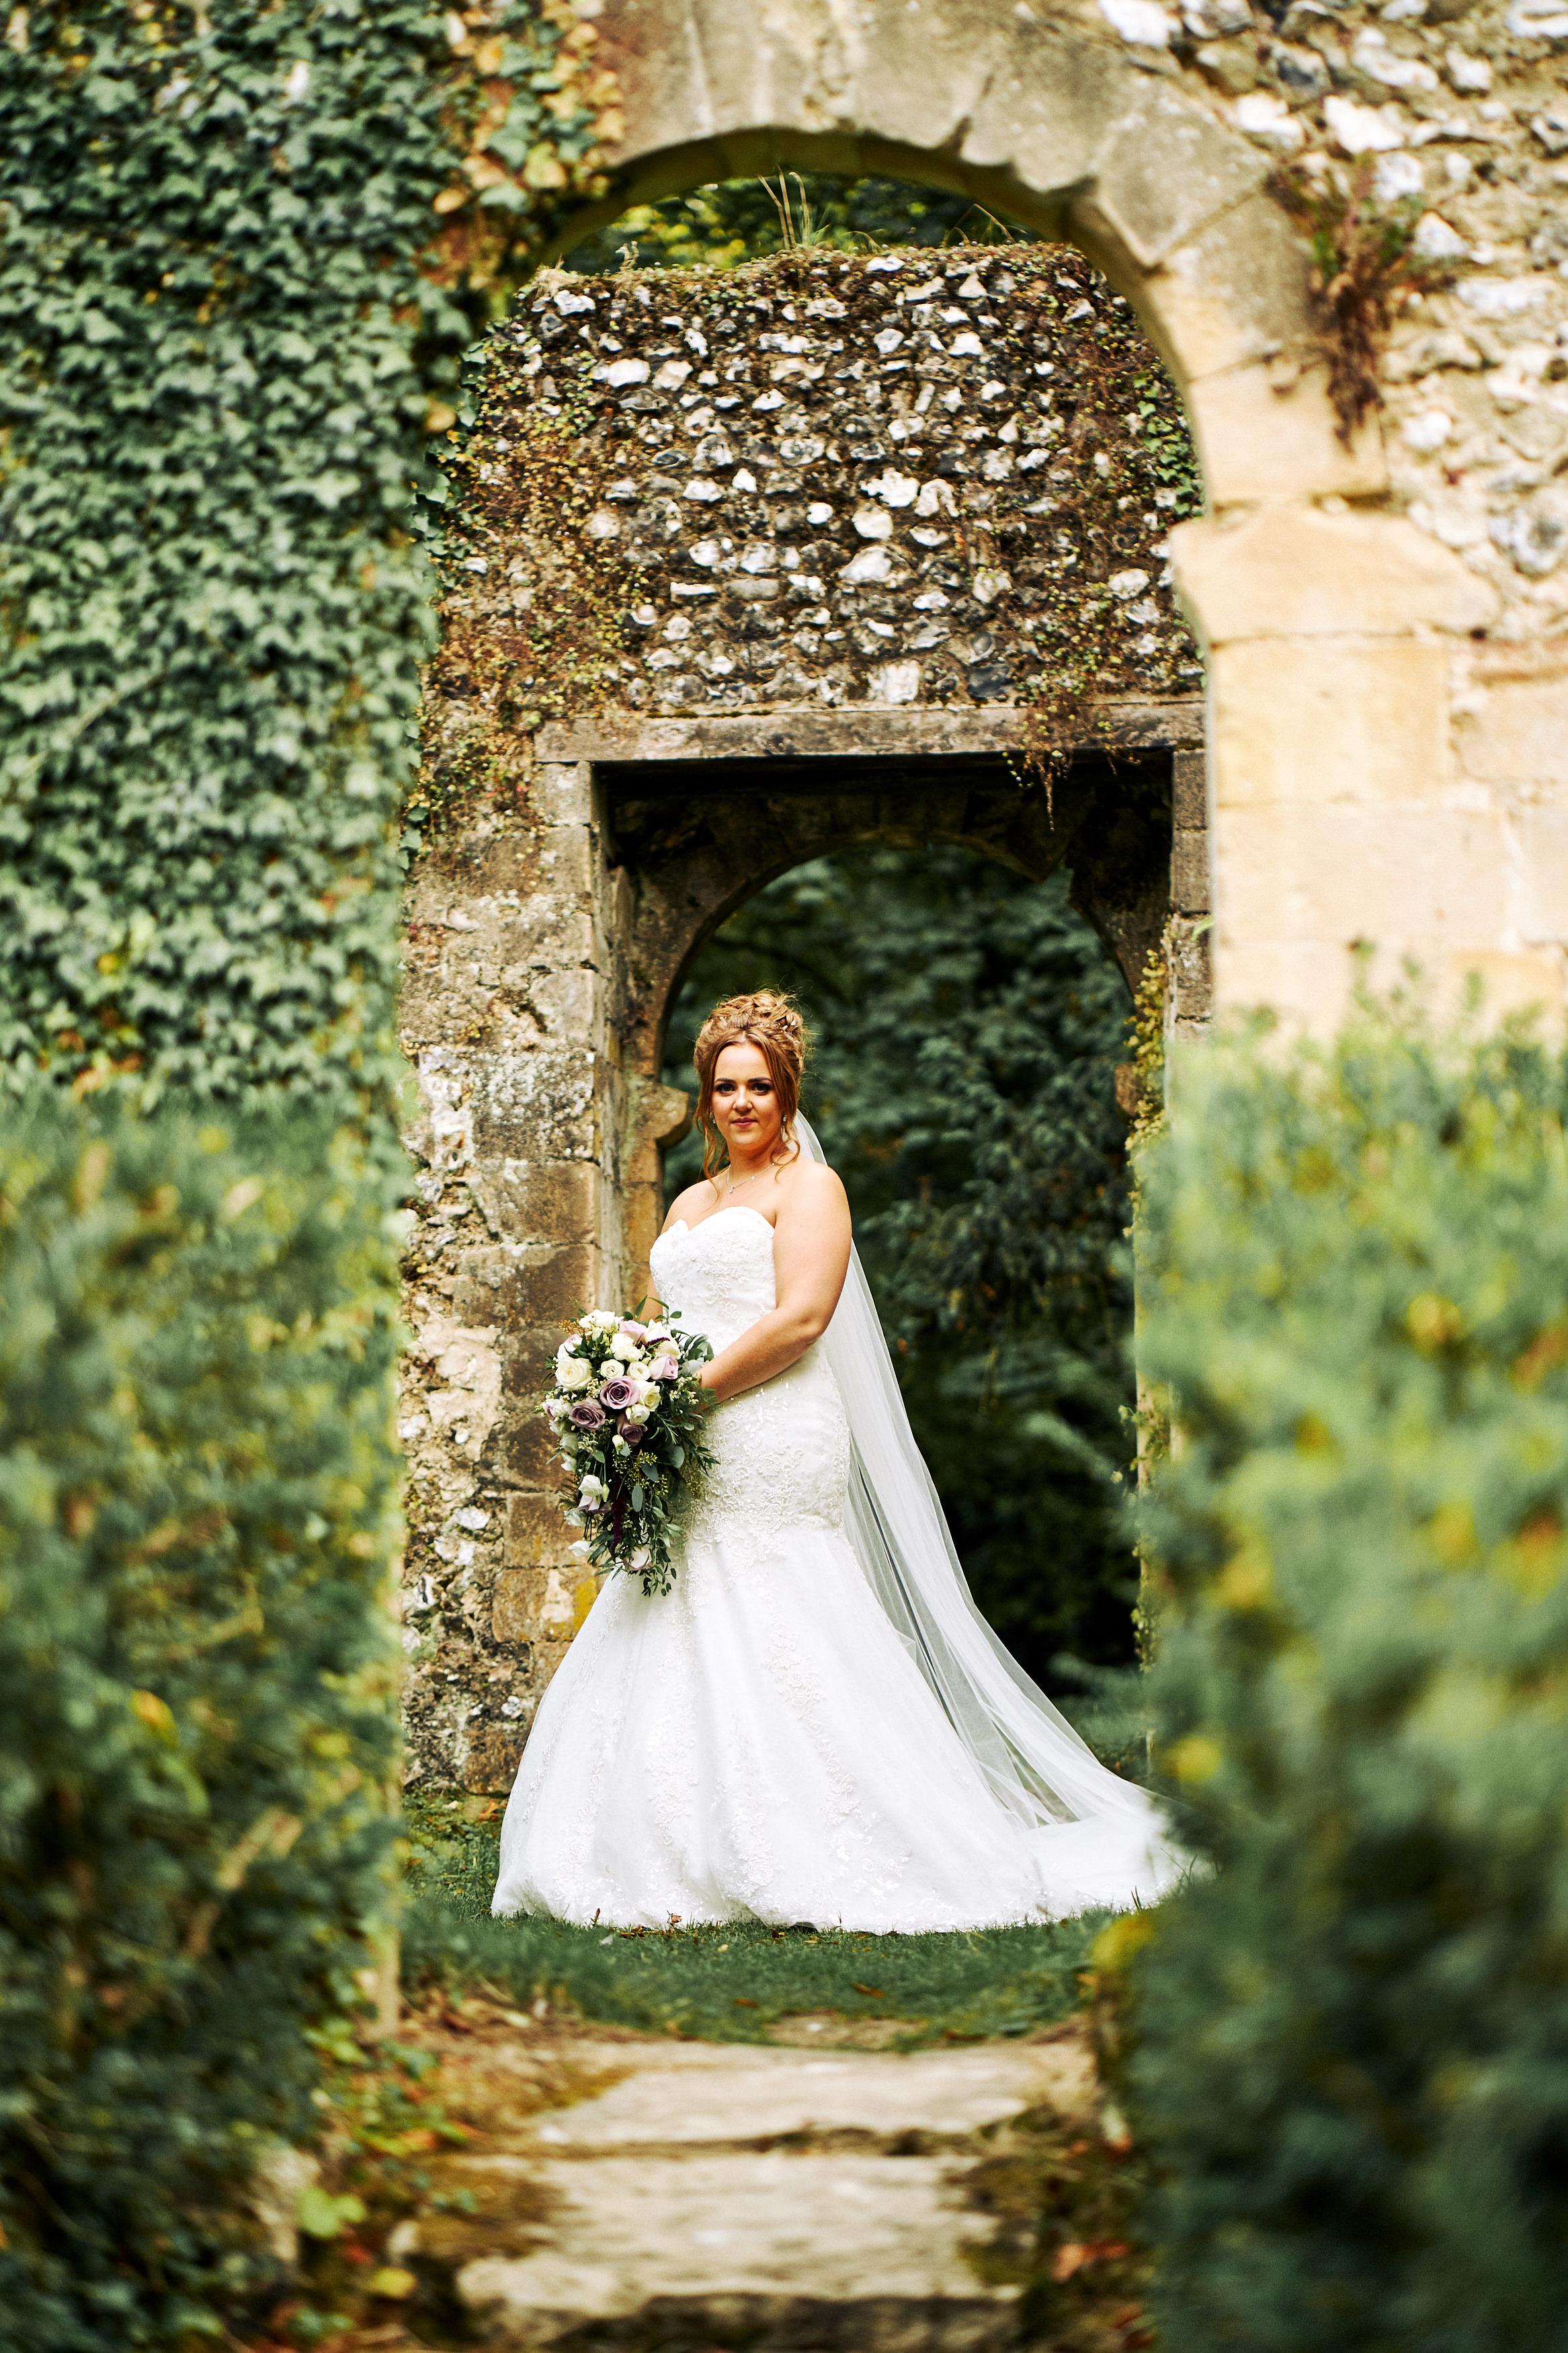 Sian Ben Wedding Lainston House at Lainston House Sparshot on 05 January 2017.